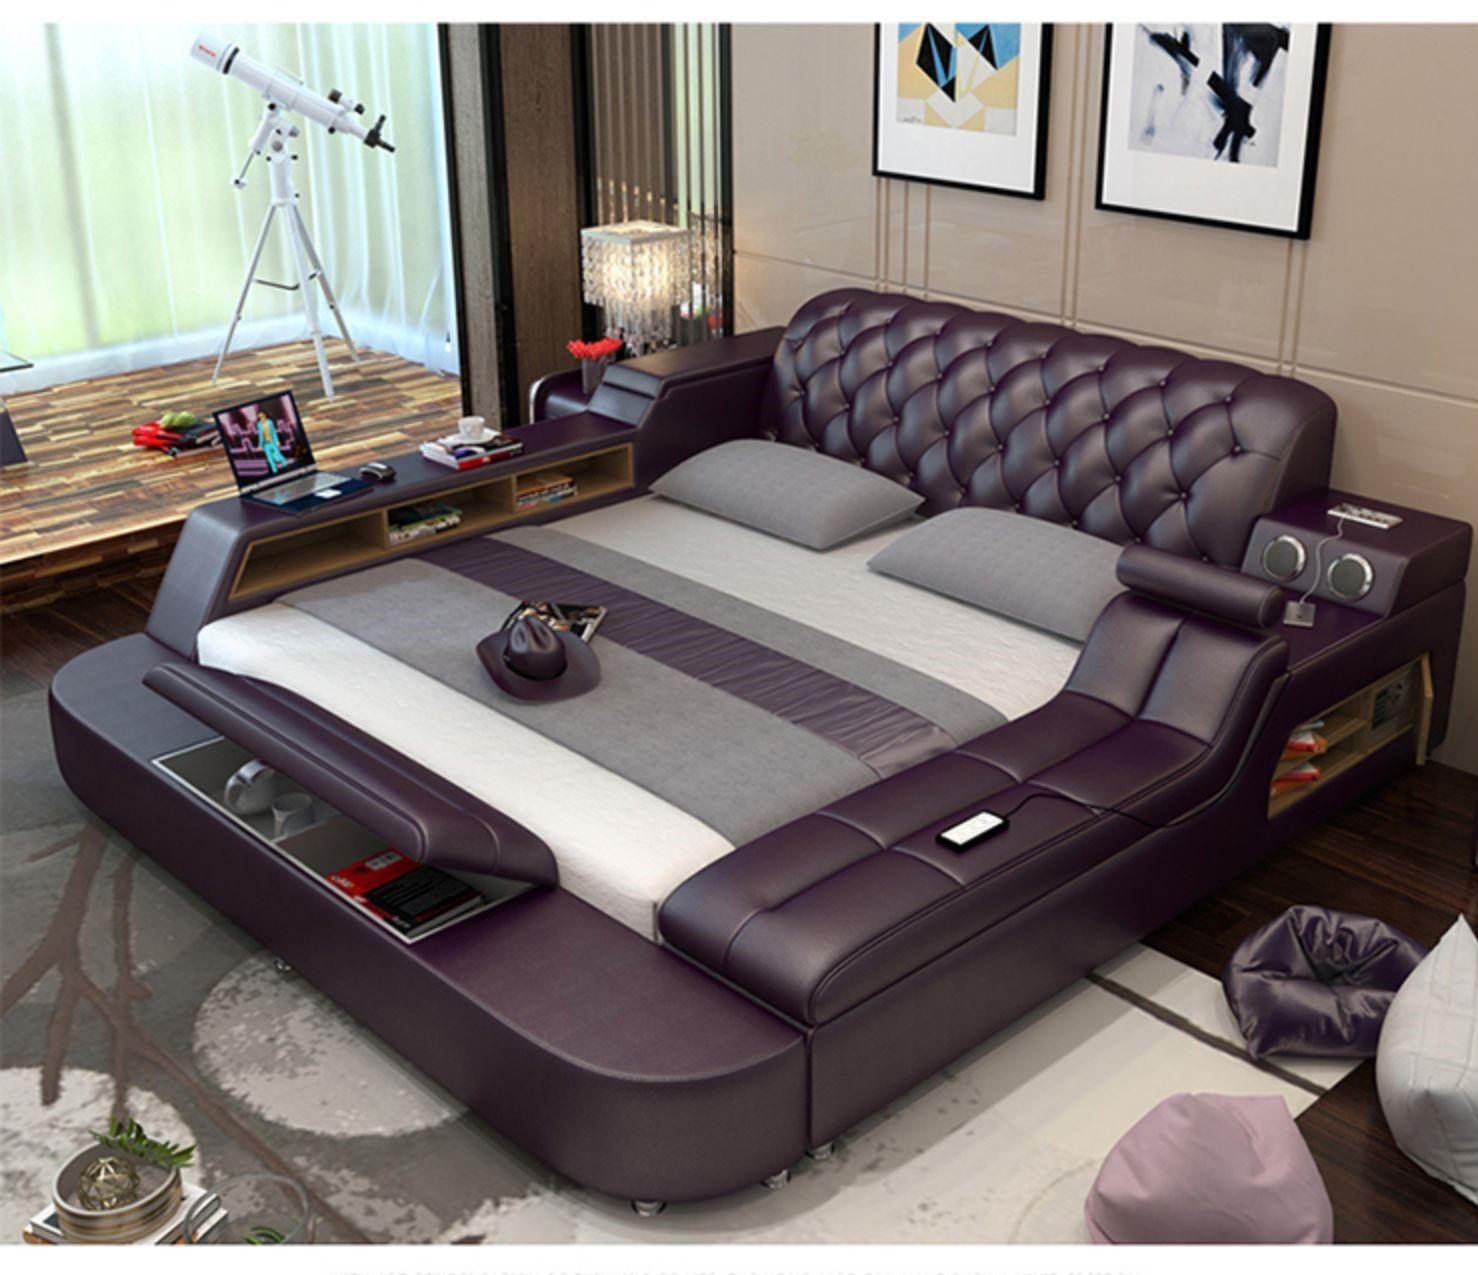 Modern smart furniture home sleeping multi-function soft genuine italian  leather  purple bed